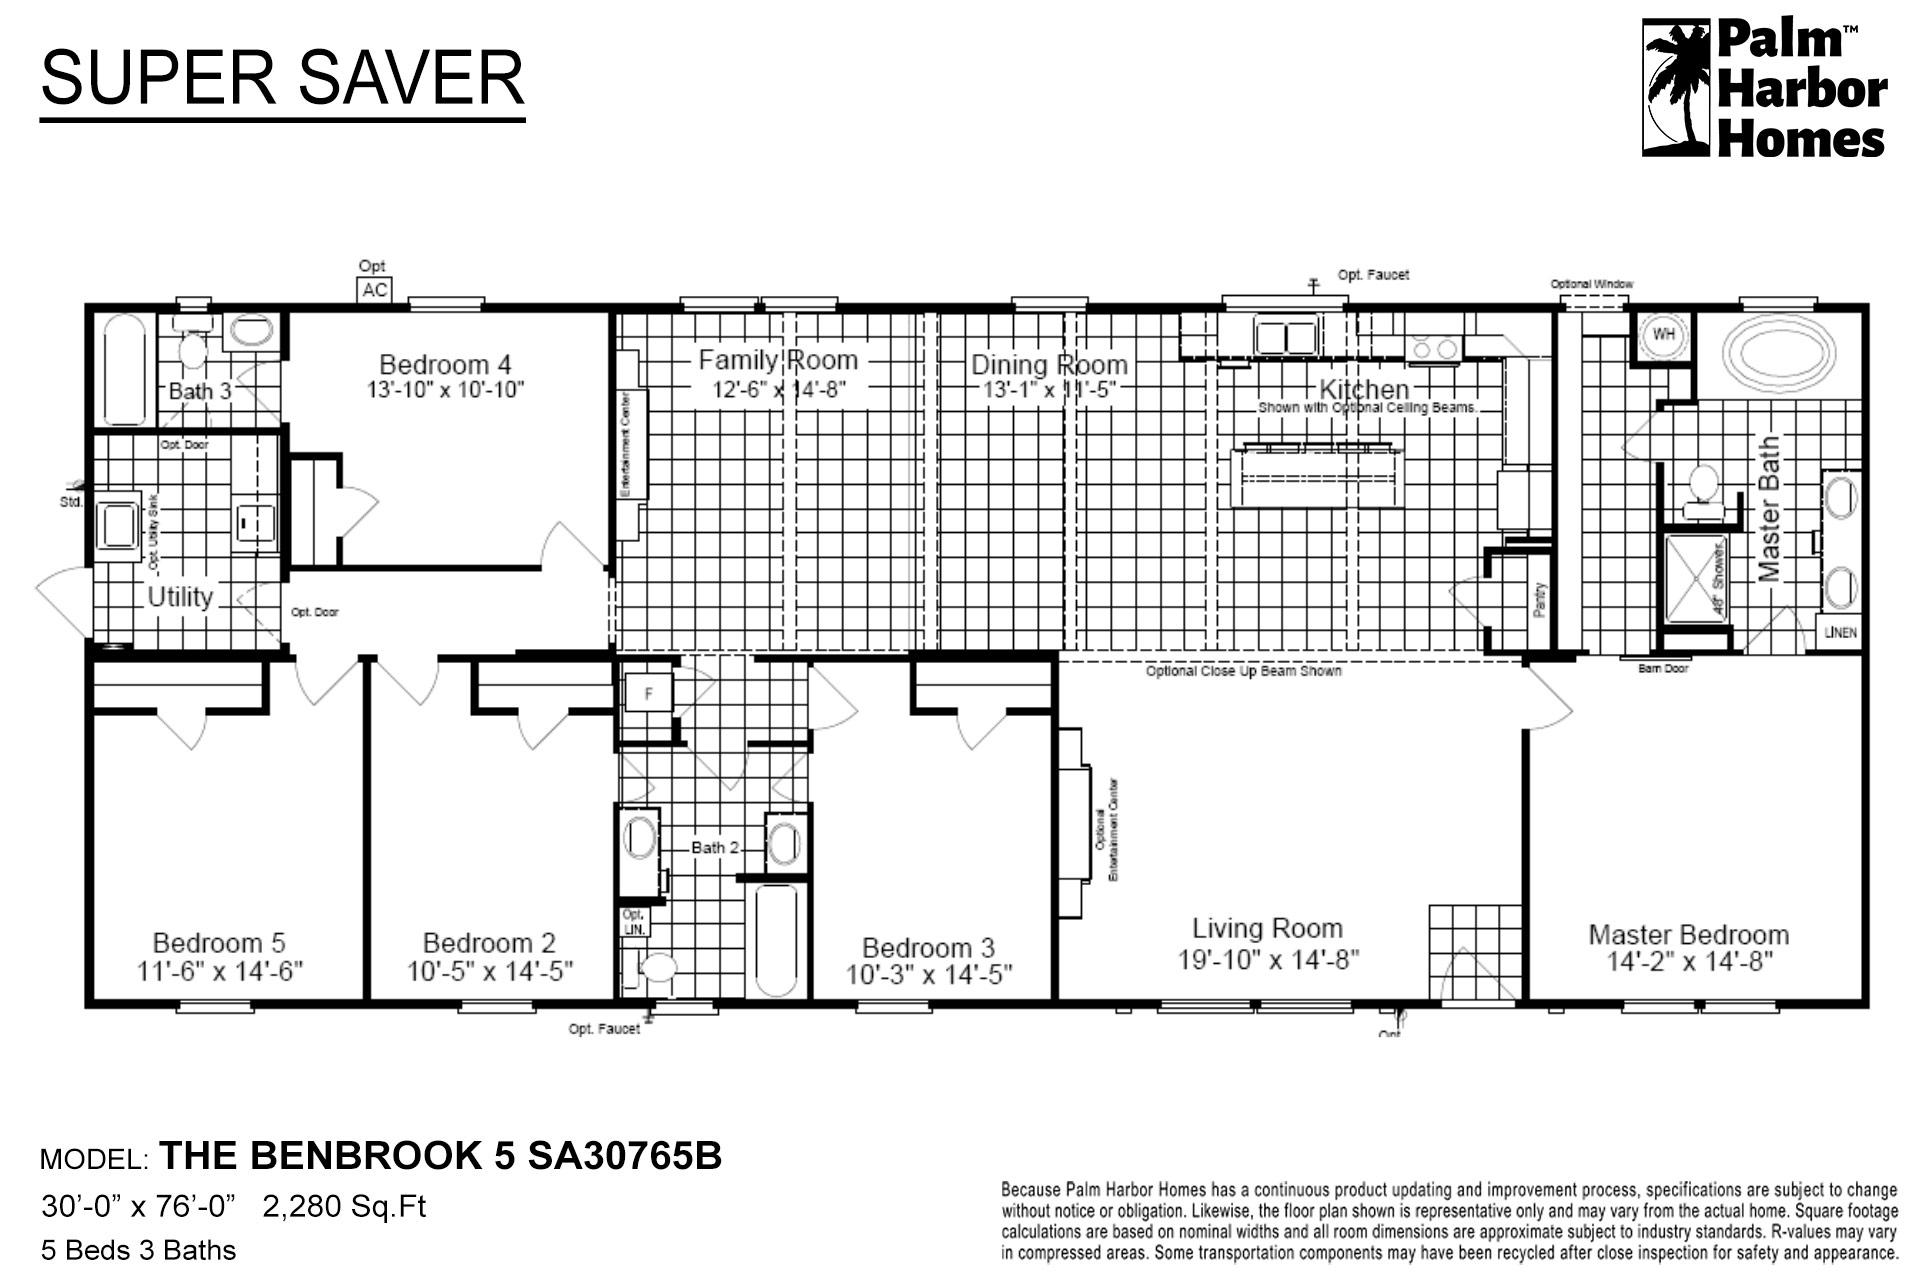 Super Saver - The Benbrook 5 SA30765B